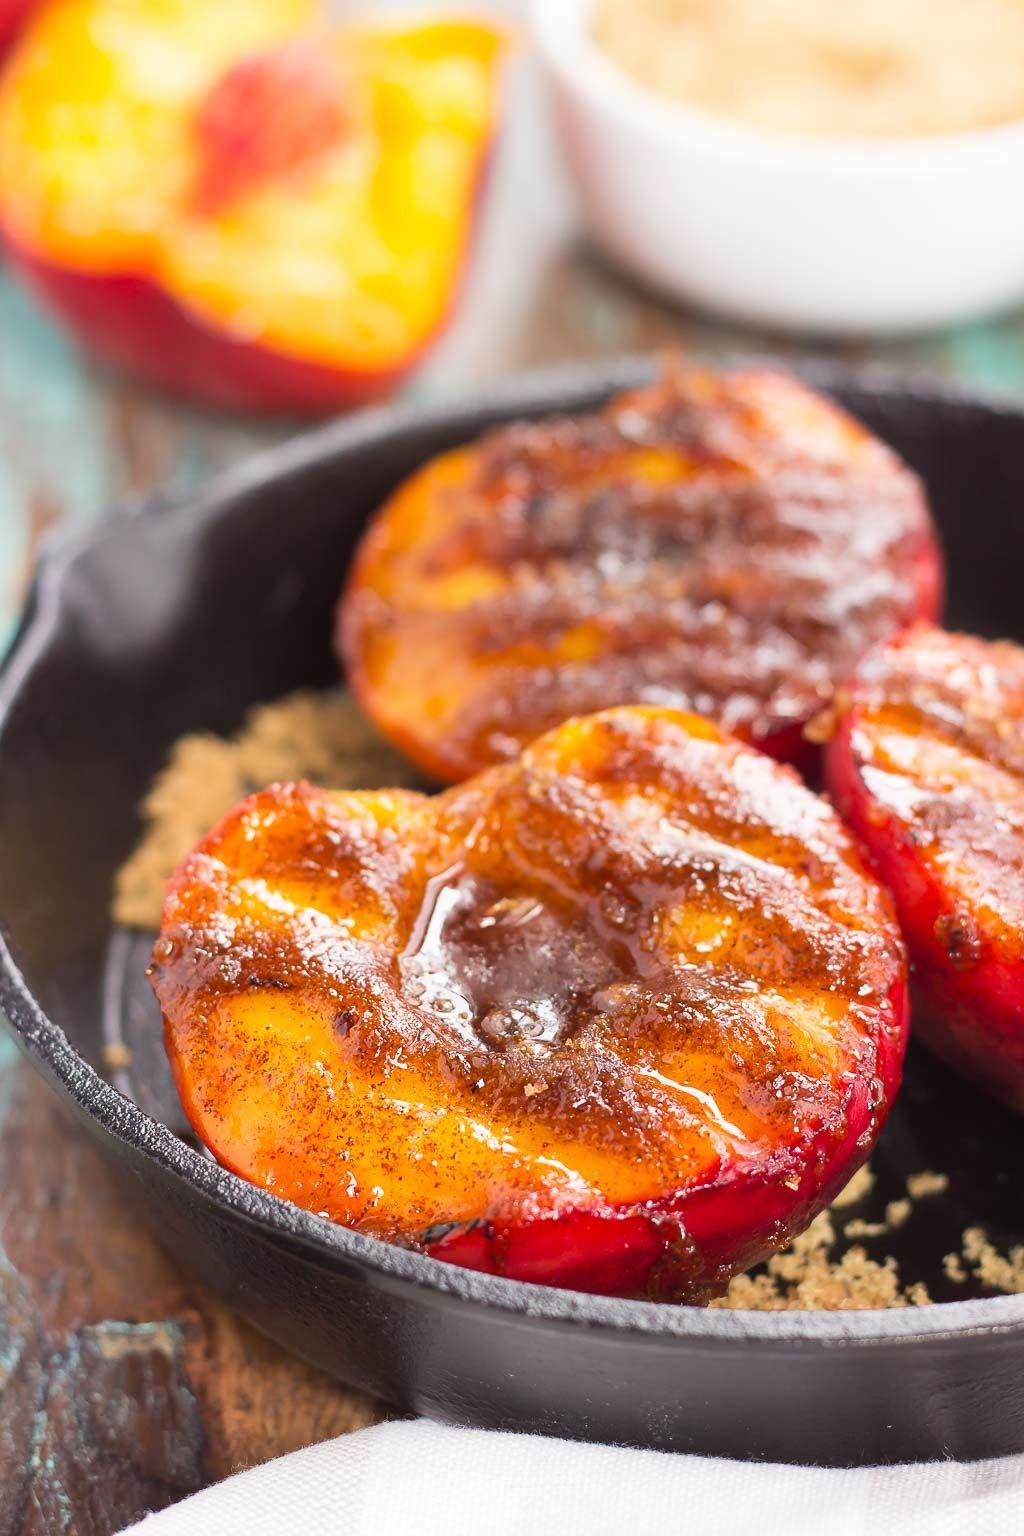 Grilled Peaches With Cinnamon And Brown Sugar Pumpkin N Spice Peach Recipe Grilled Peaches Food